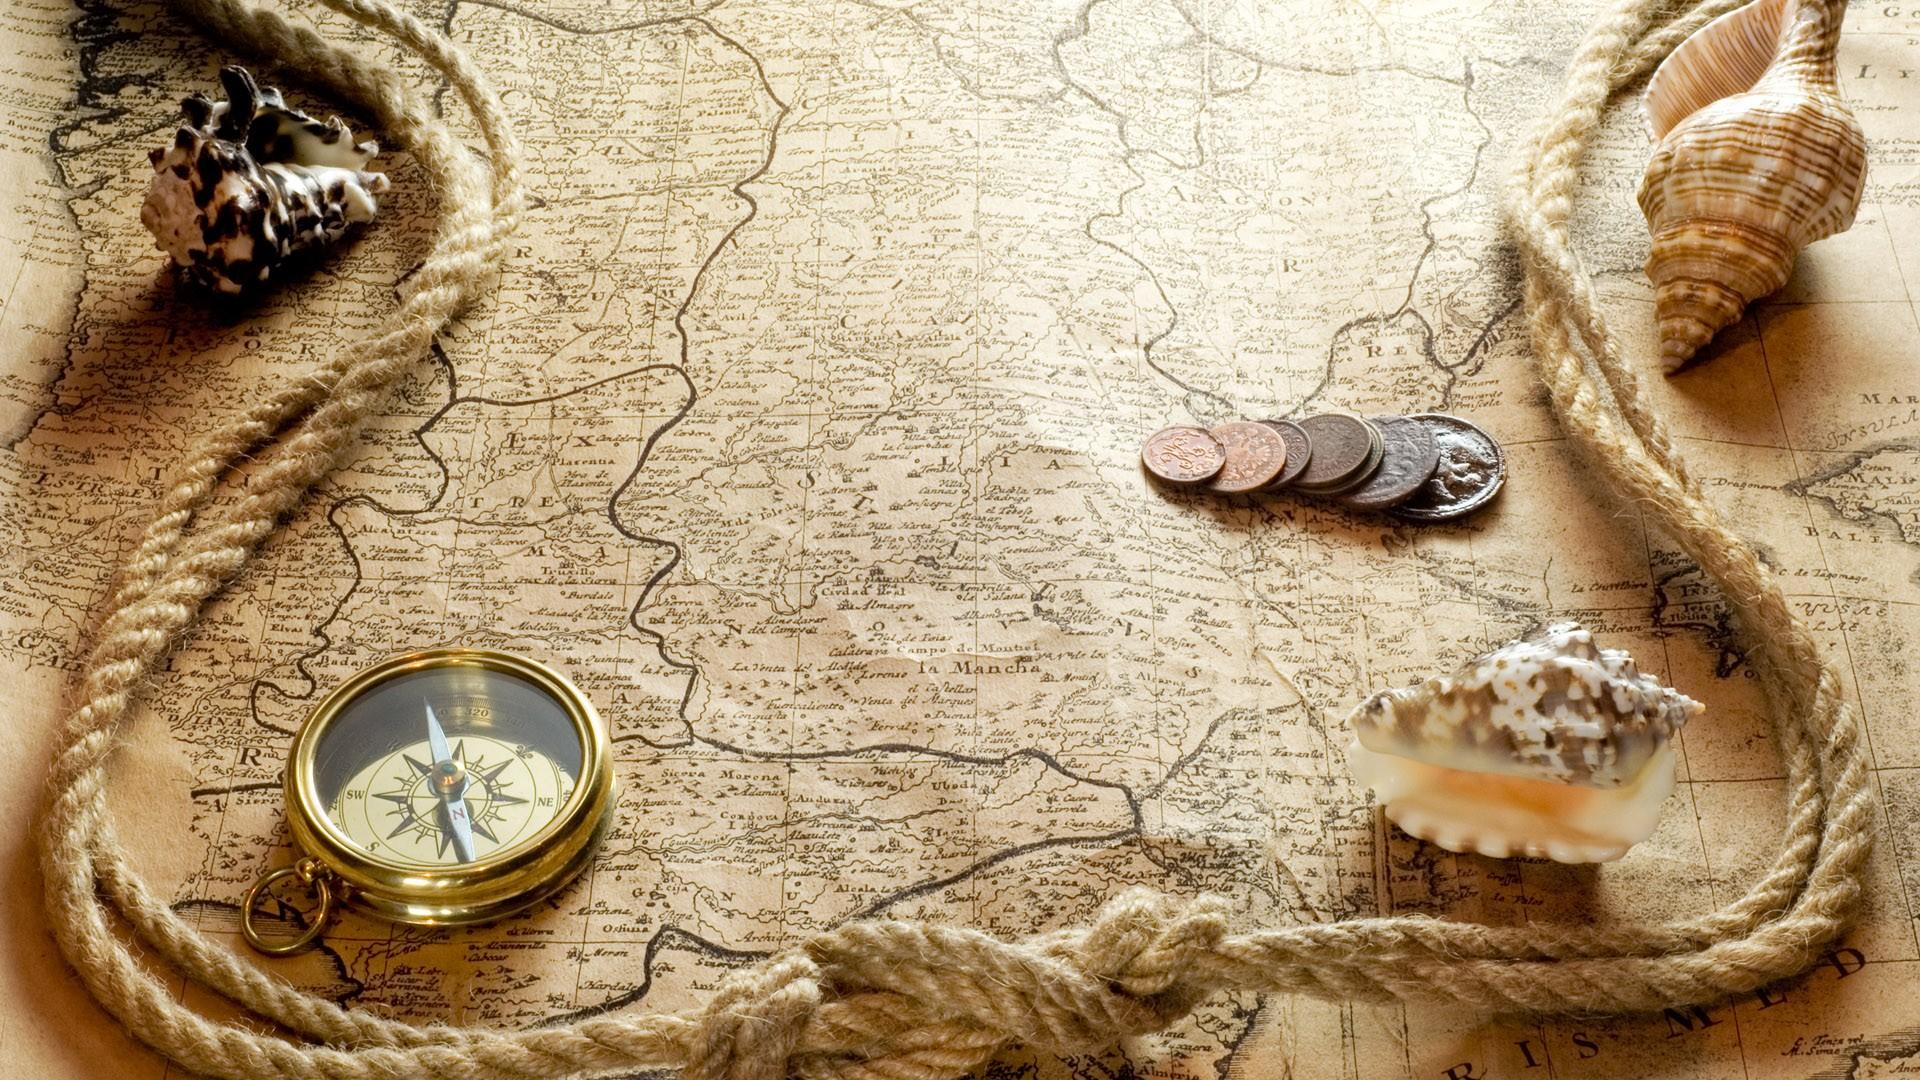 download Maps Compasses Wallpaper 1920x1080 Maps Compasses 1920x1080